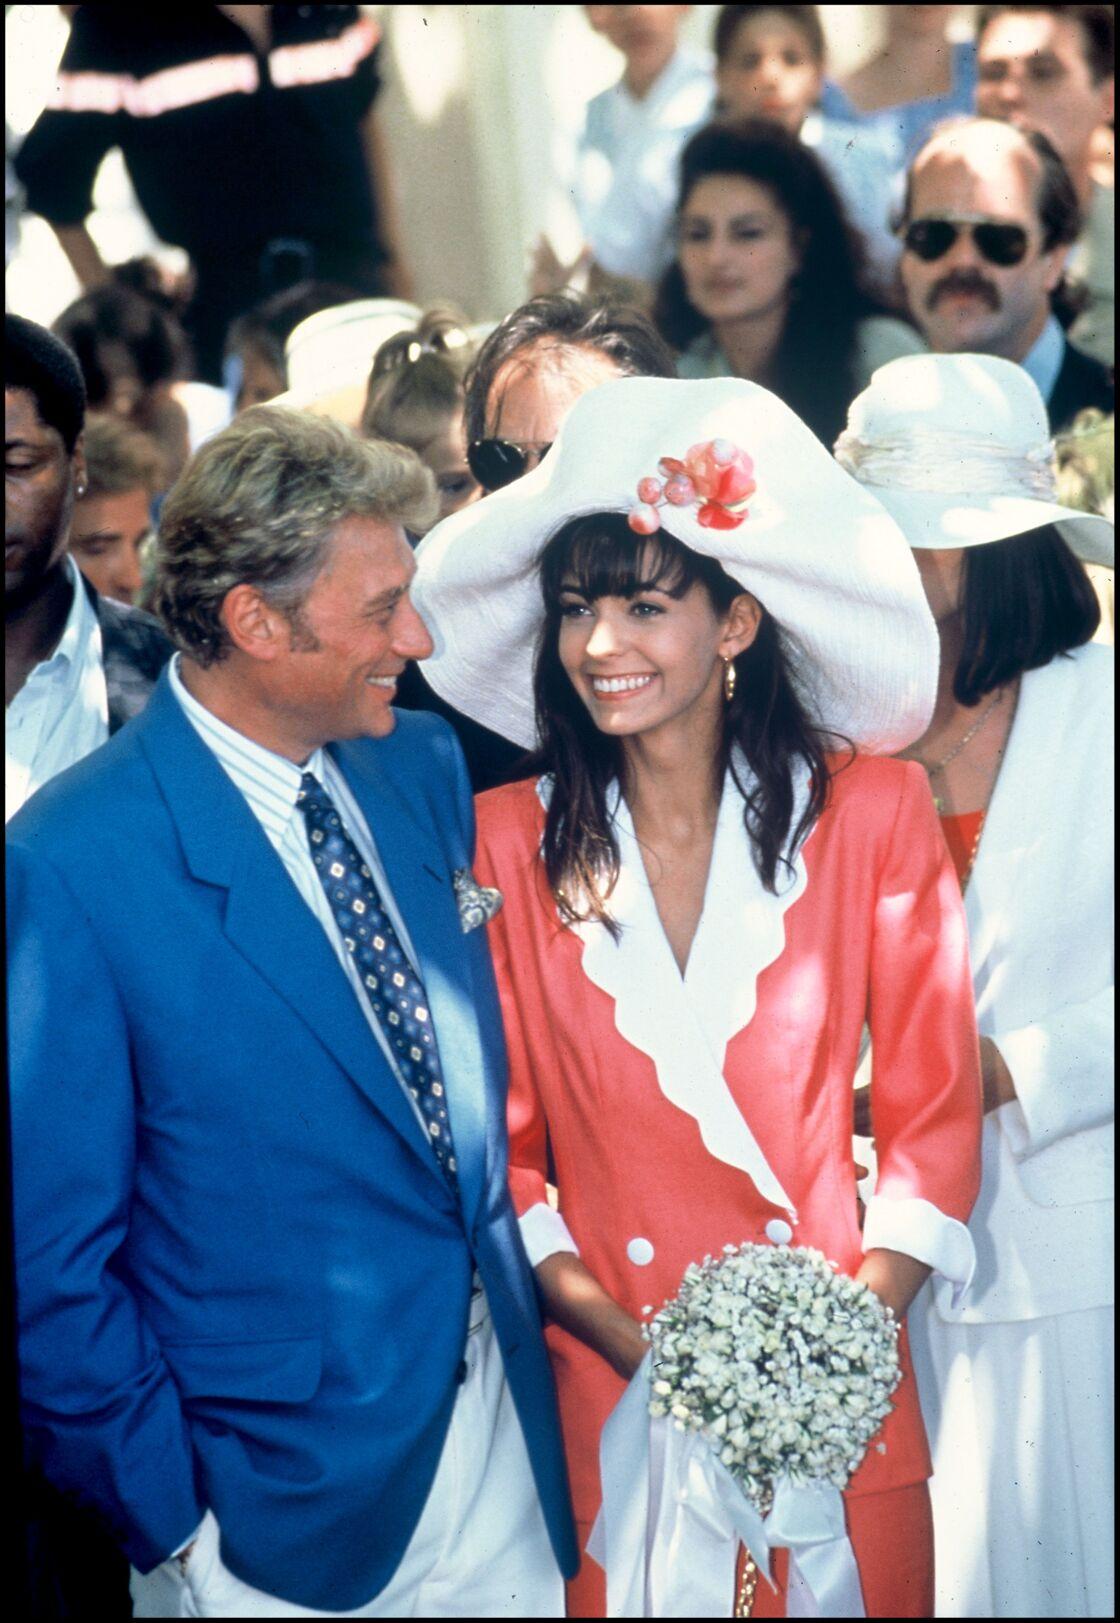 Adeline Blondieau et Johnny Hallyday, en 1990.